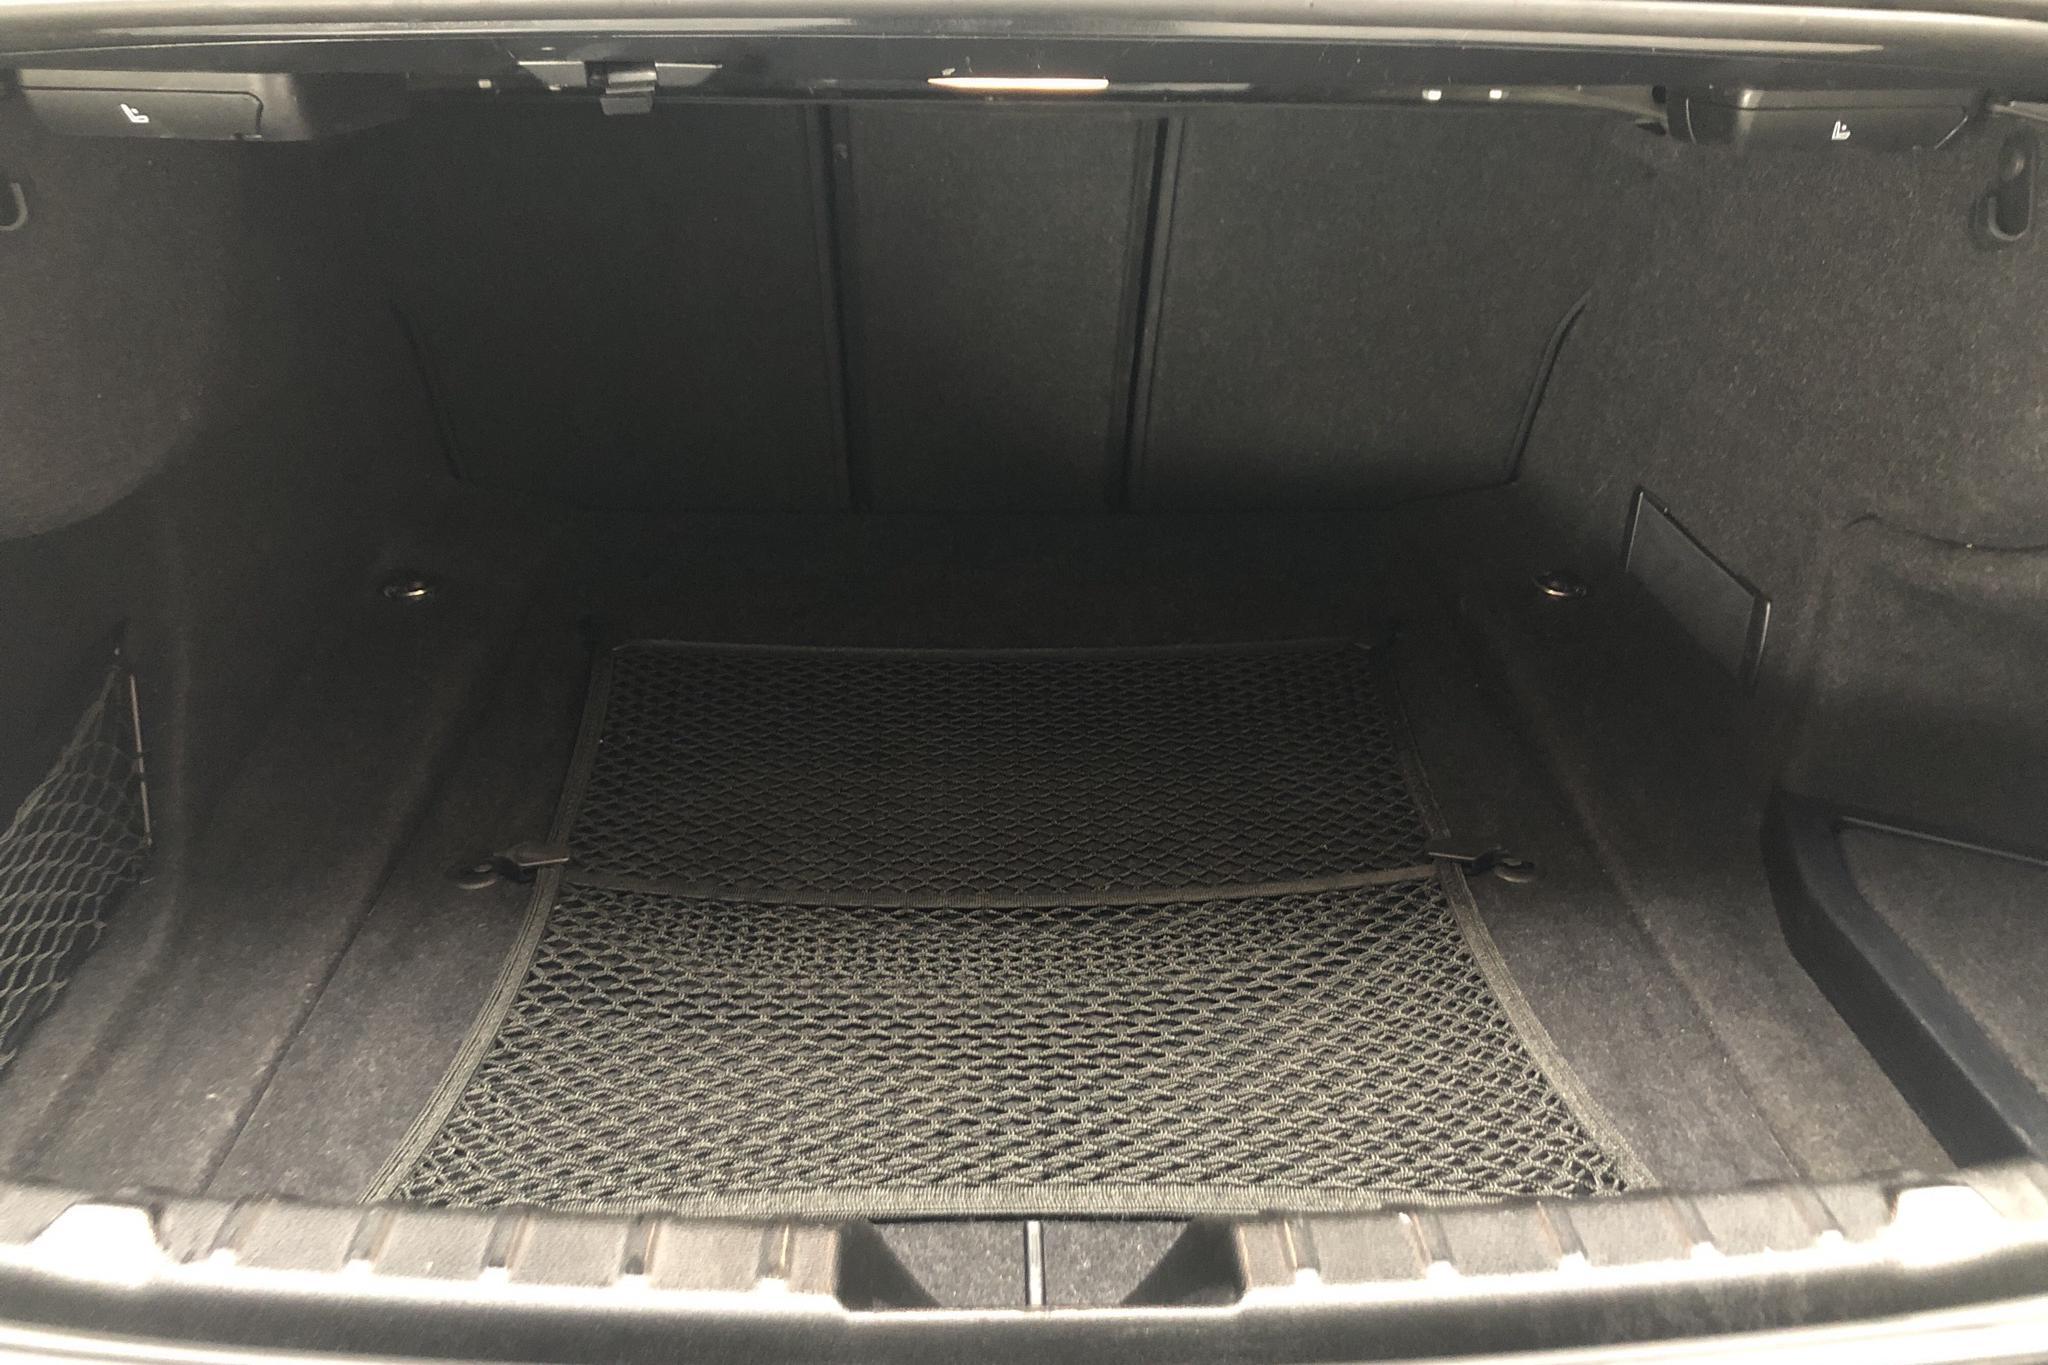 BMW 435i Coupé, F32 (306hk) - 124 020 km - Automatic - black - 2015